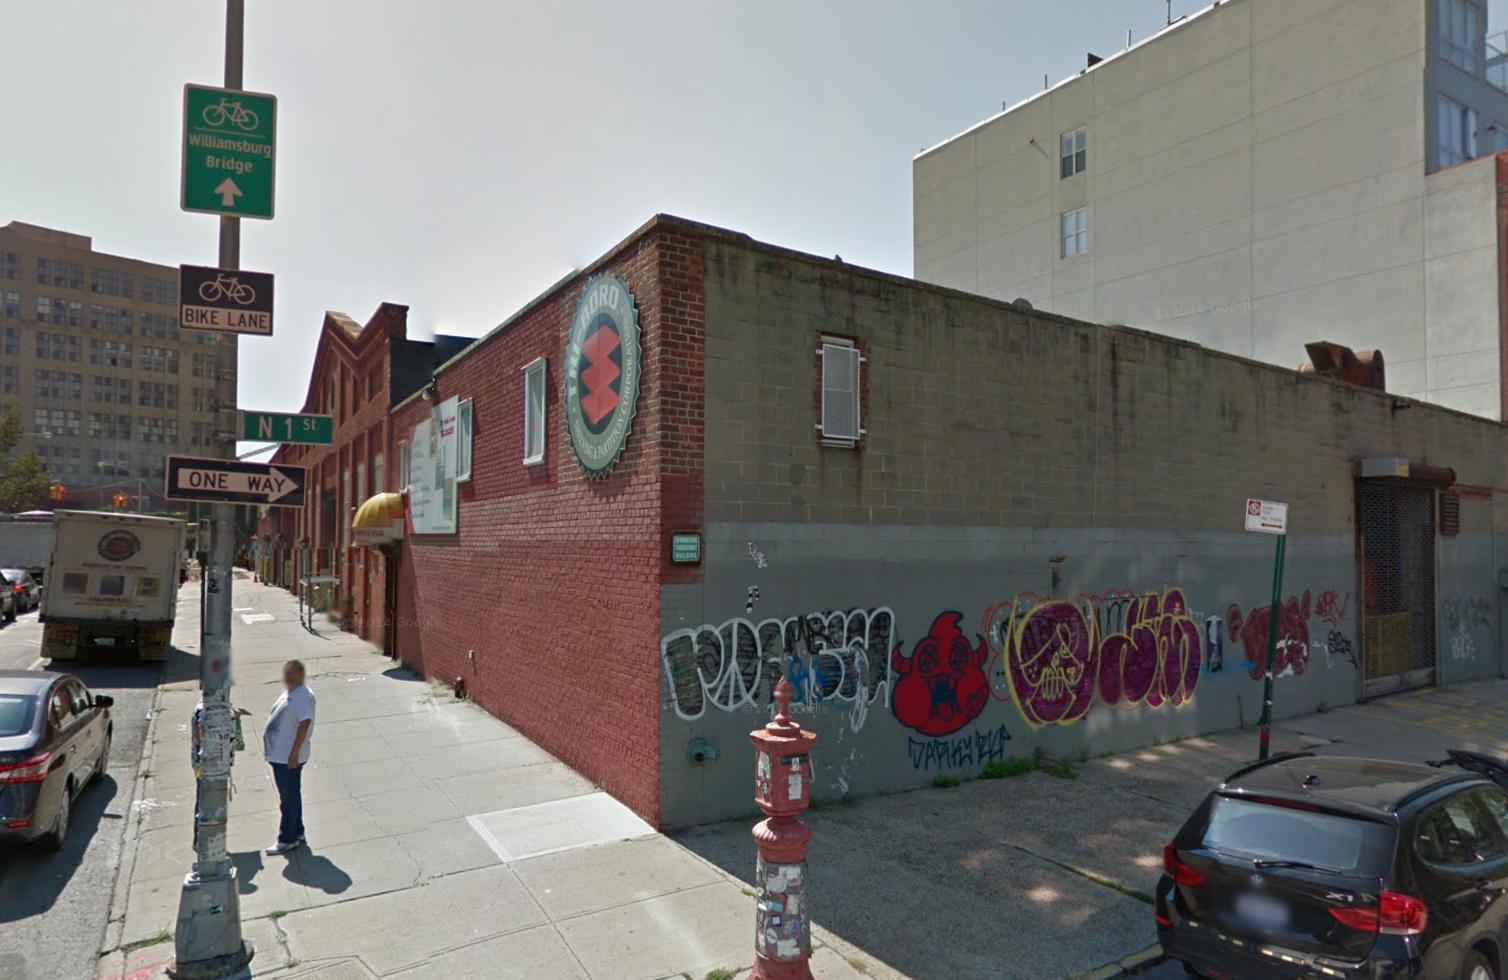 296 Wythe Avenue